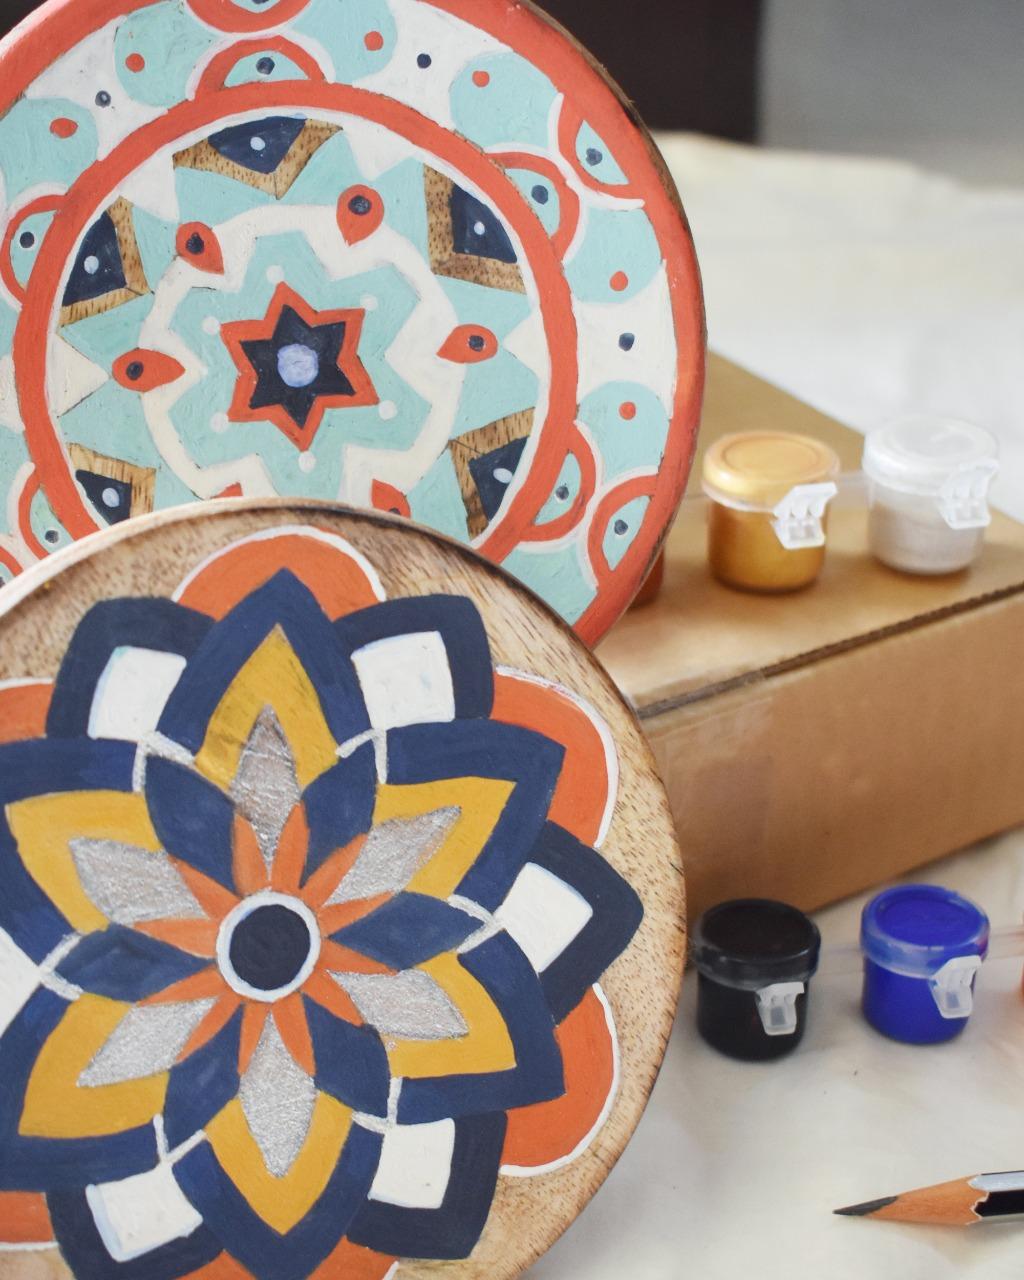 Mandala on Wooden Plate